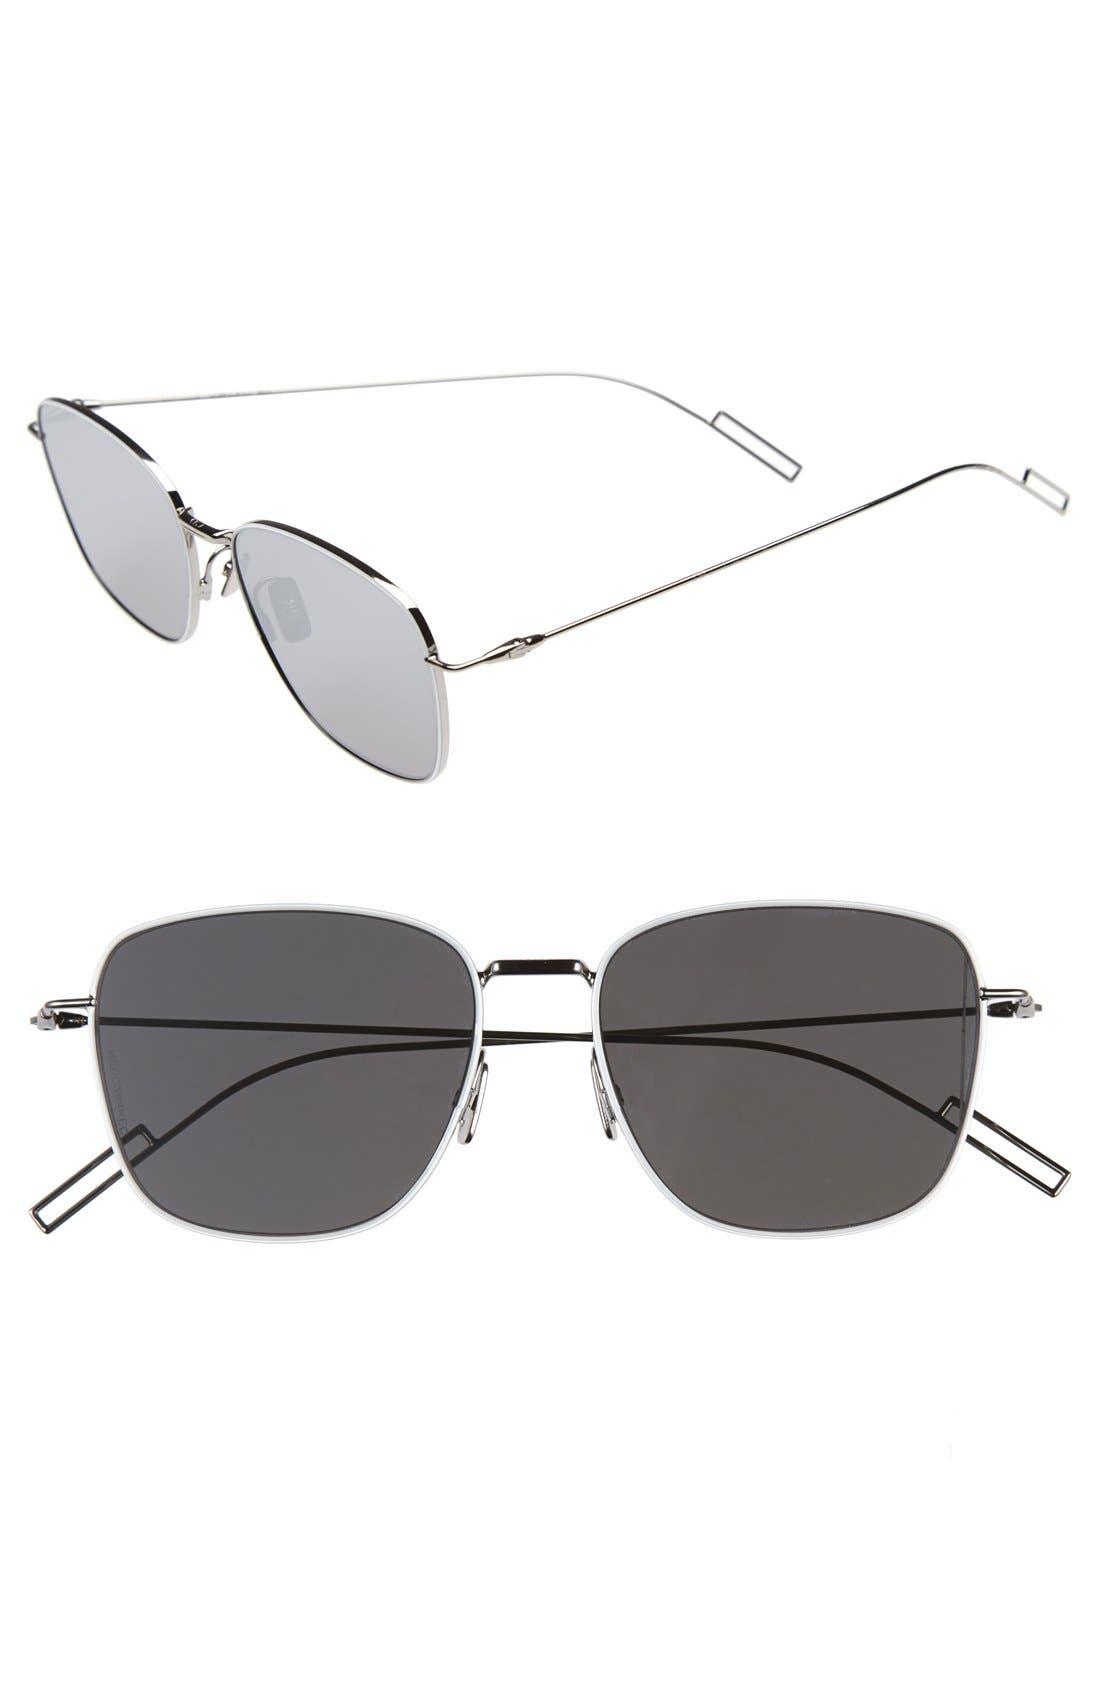 'Composit 1.1S' 54mm Metal Sunglasses,                         Main,                         color, PALLADIUM/ GREY SILVER MIRROR